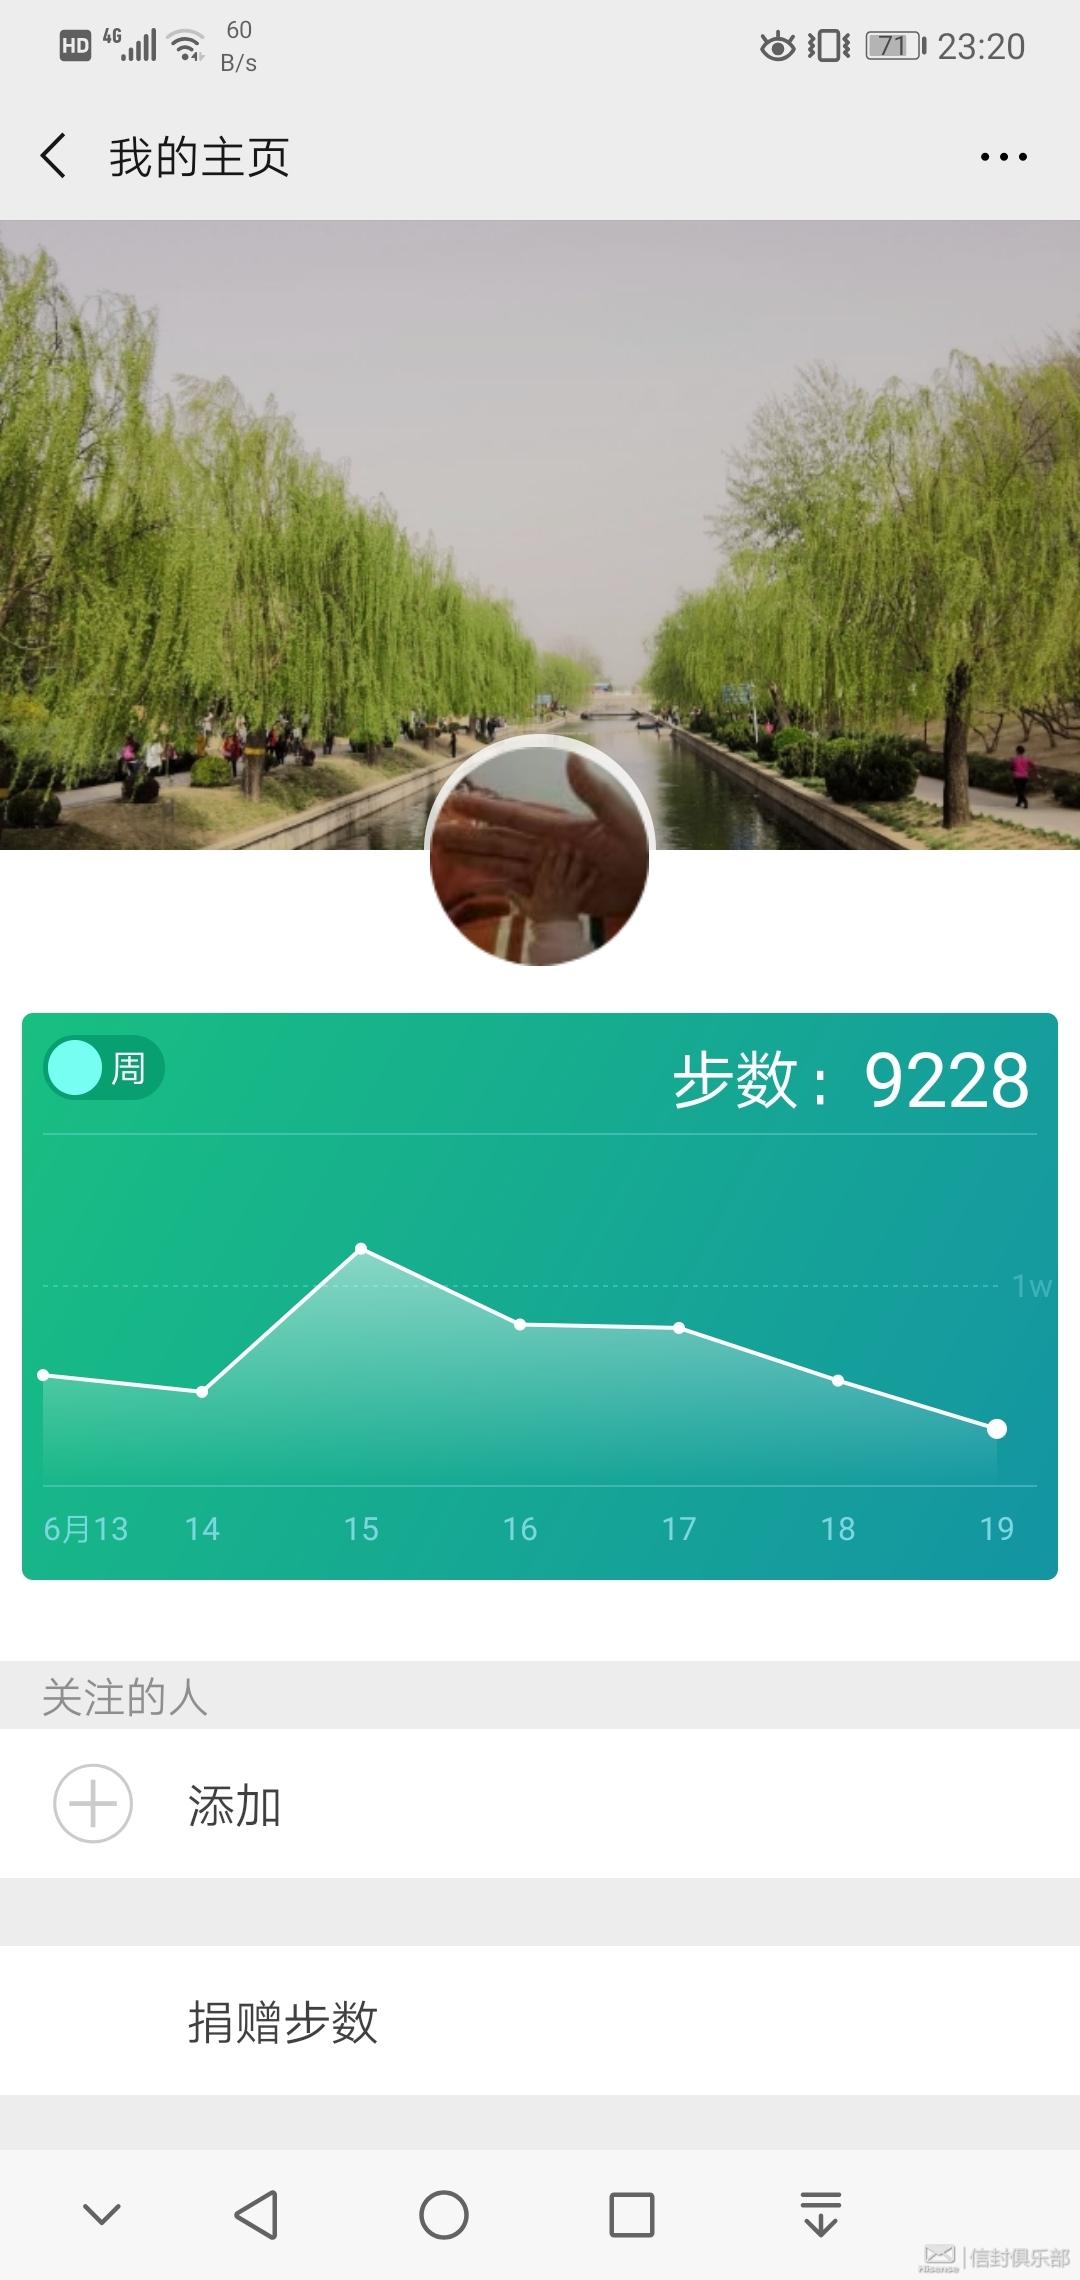 Screenshot_20190626_232028_com.tencent.mm.jpg